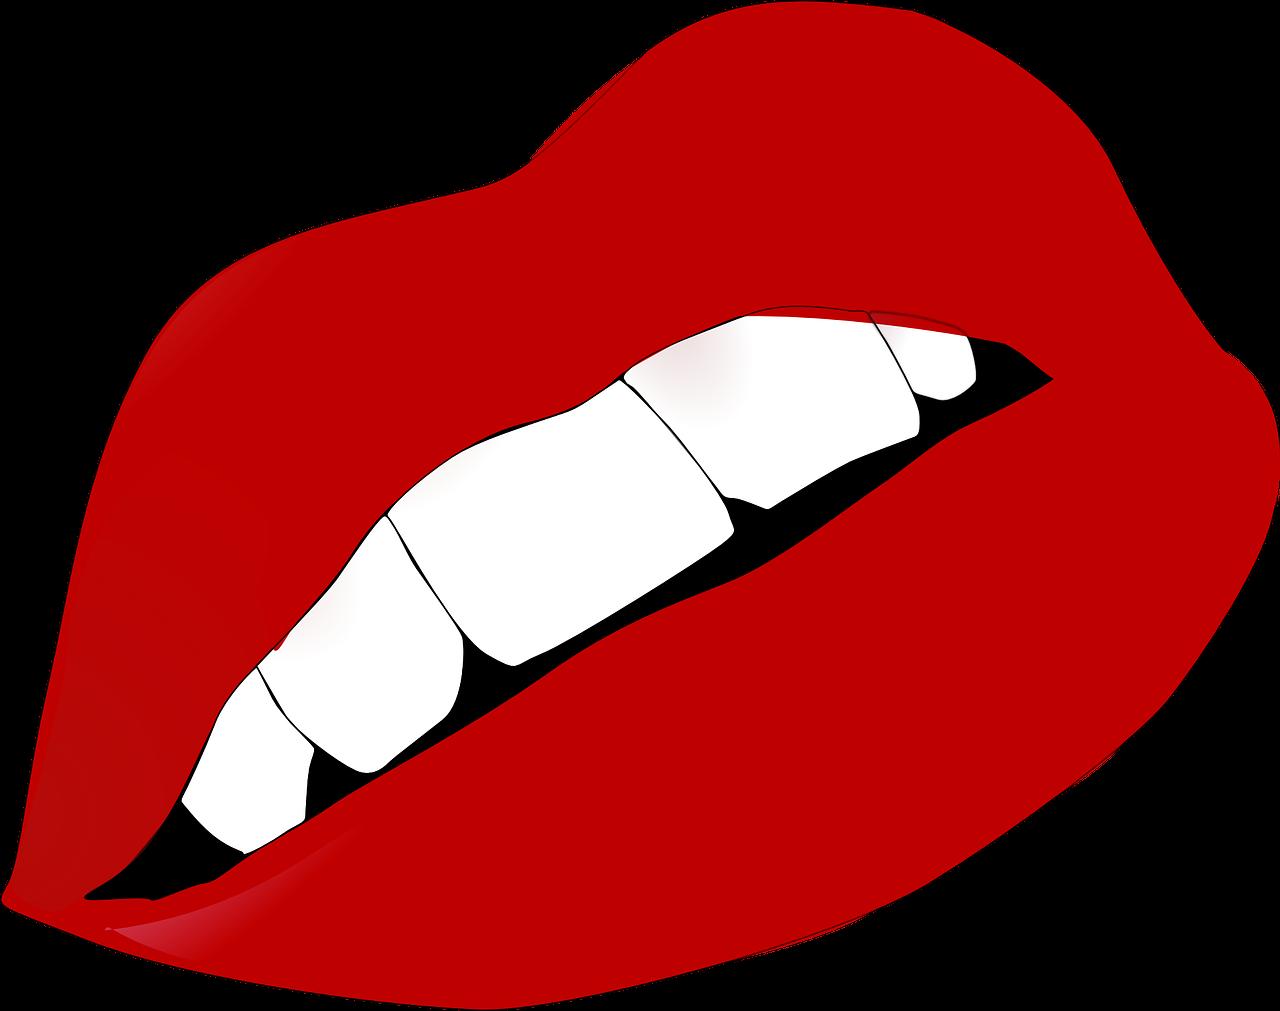 Открытка, губы с зубами картинка